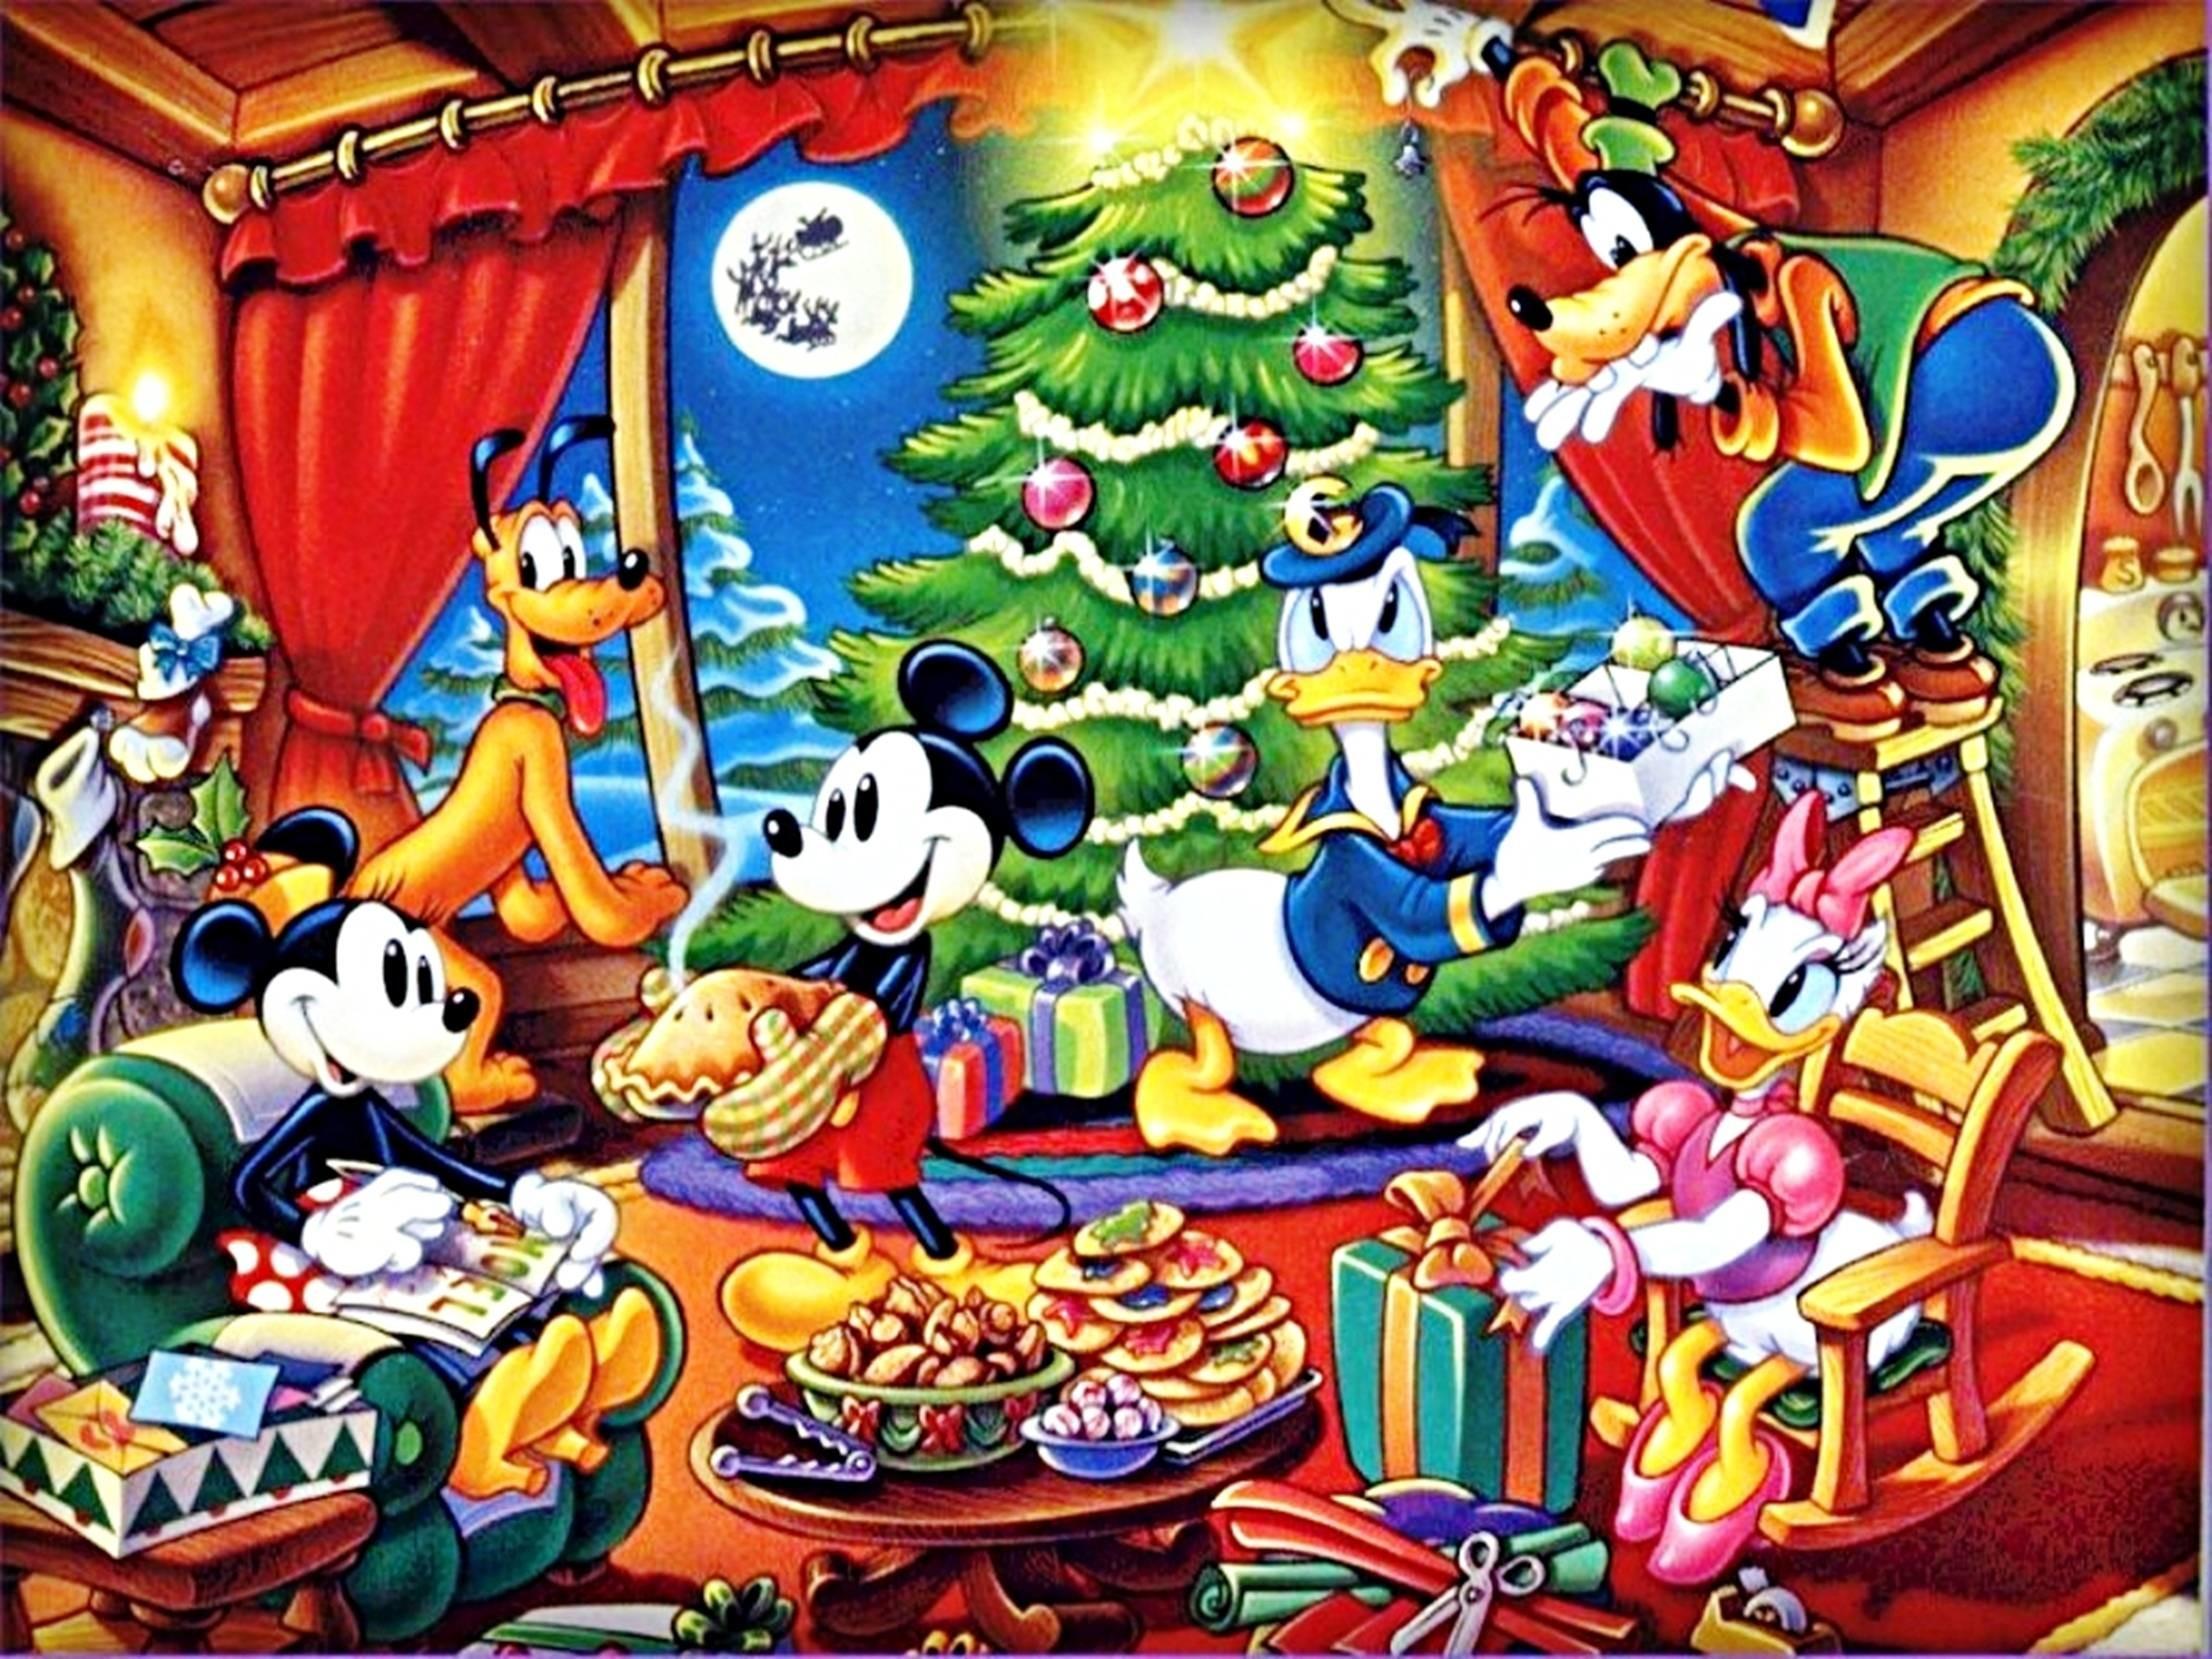 Res: 2212x1659, Disney Christmas HD Background wallpaper | wollpopor.